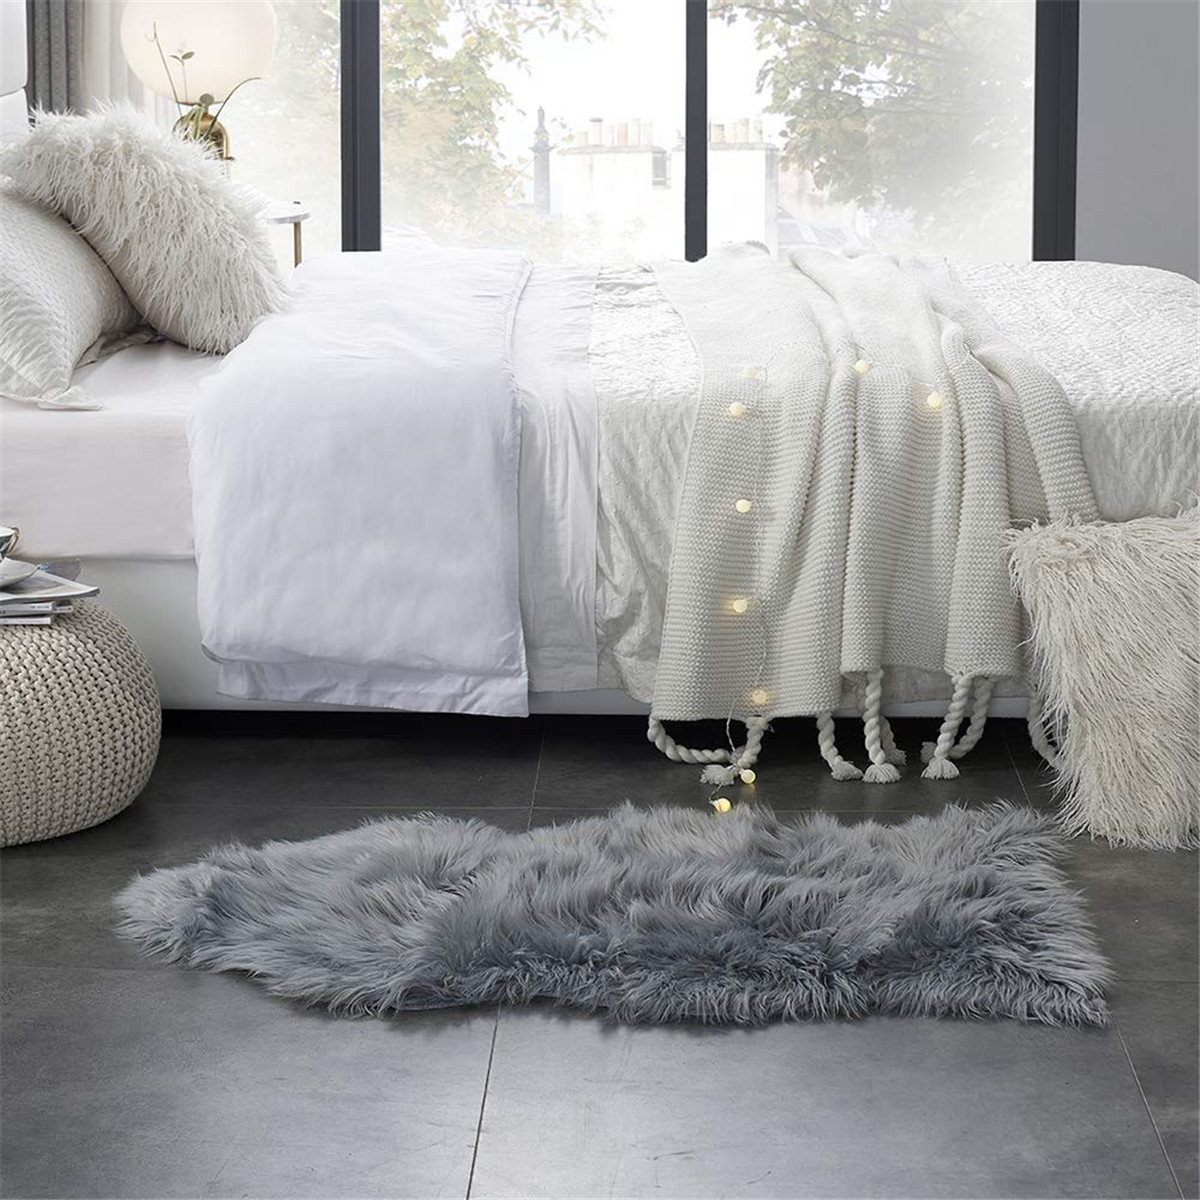 Faux Sheepskin Fur Rug Soft Fluffy Carpets Chair Couch